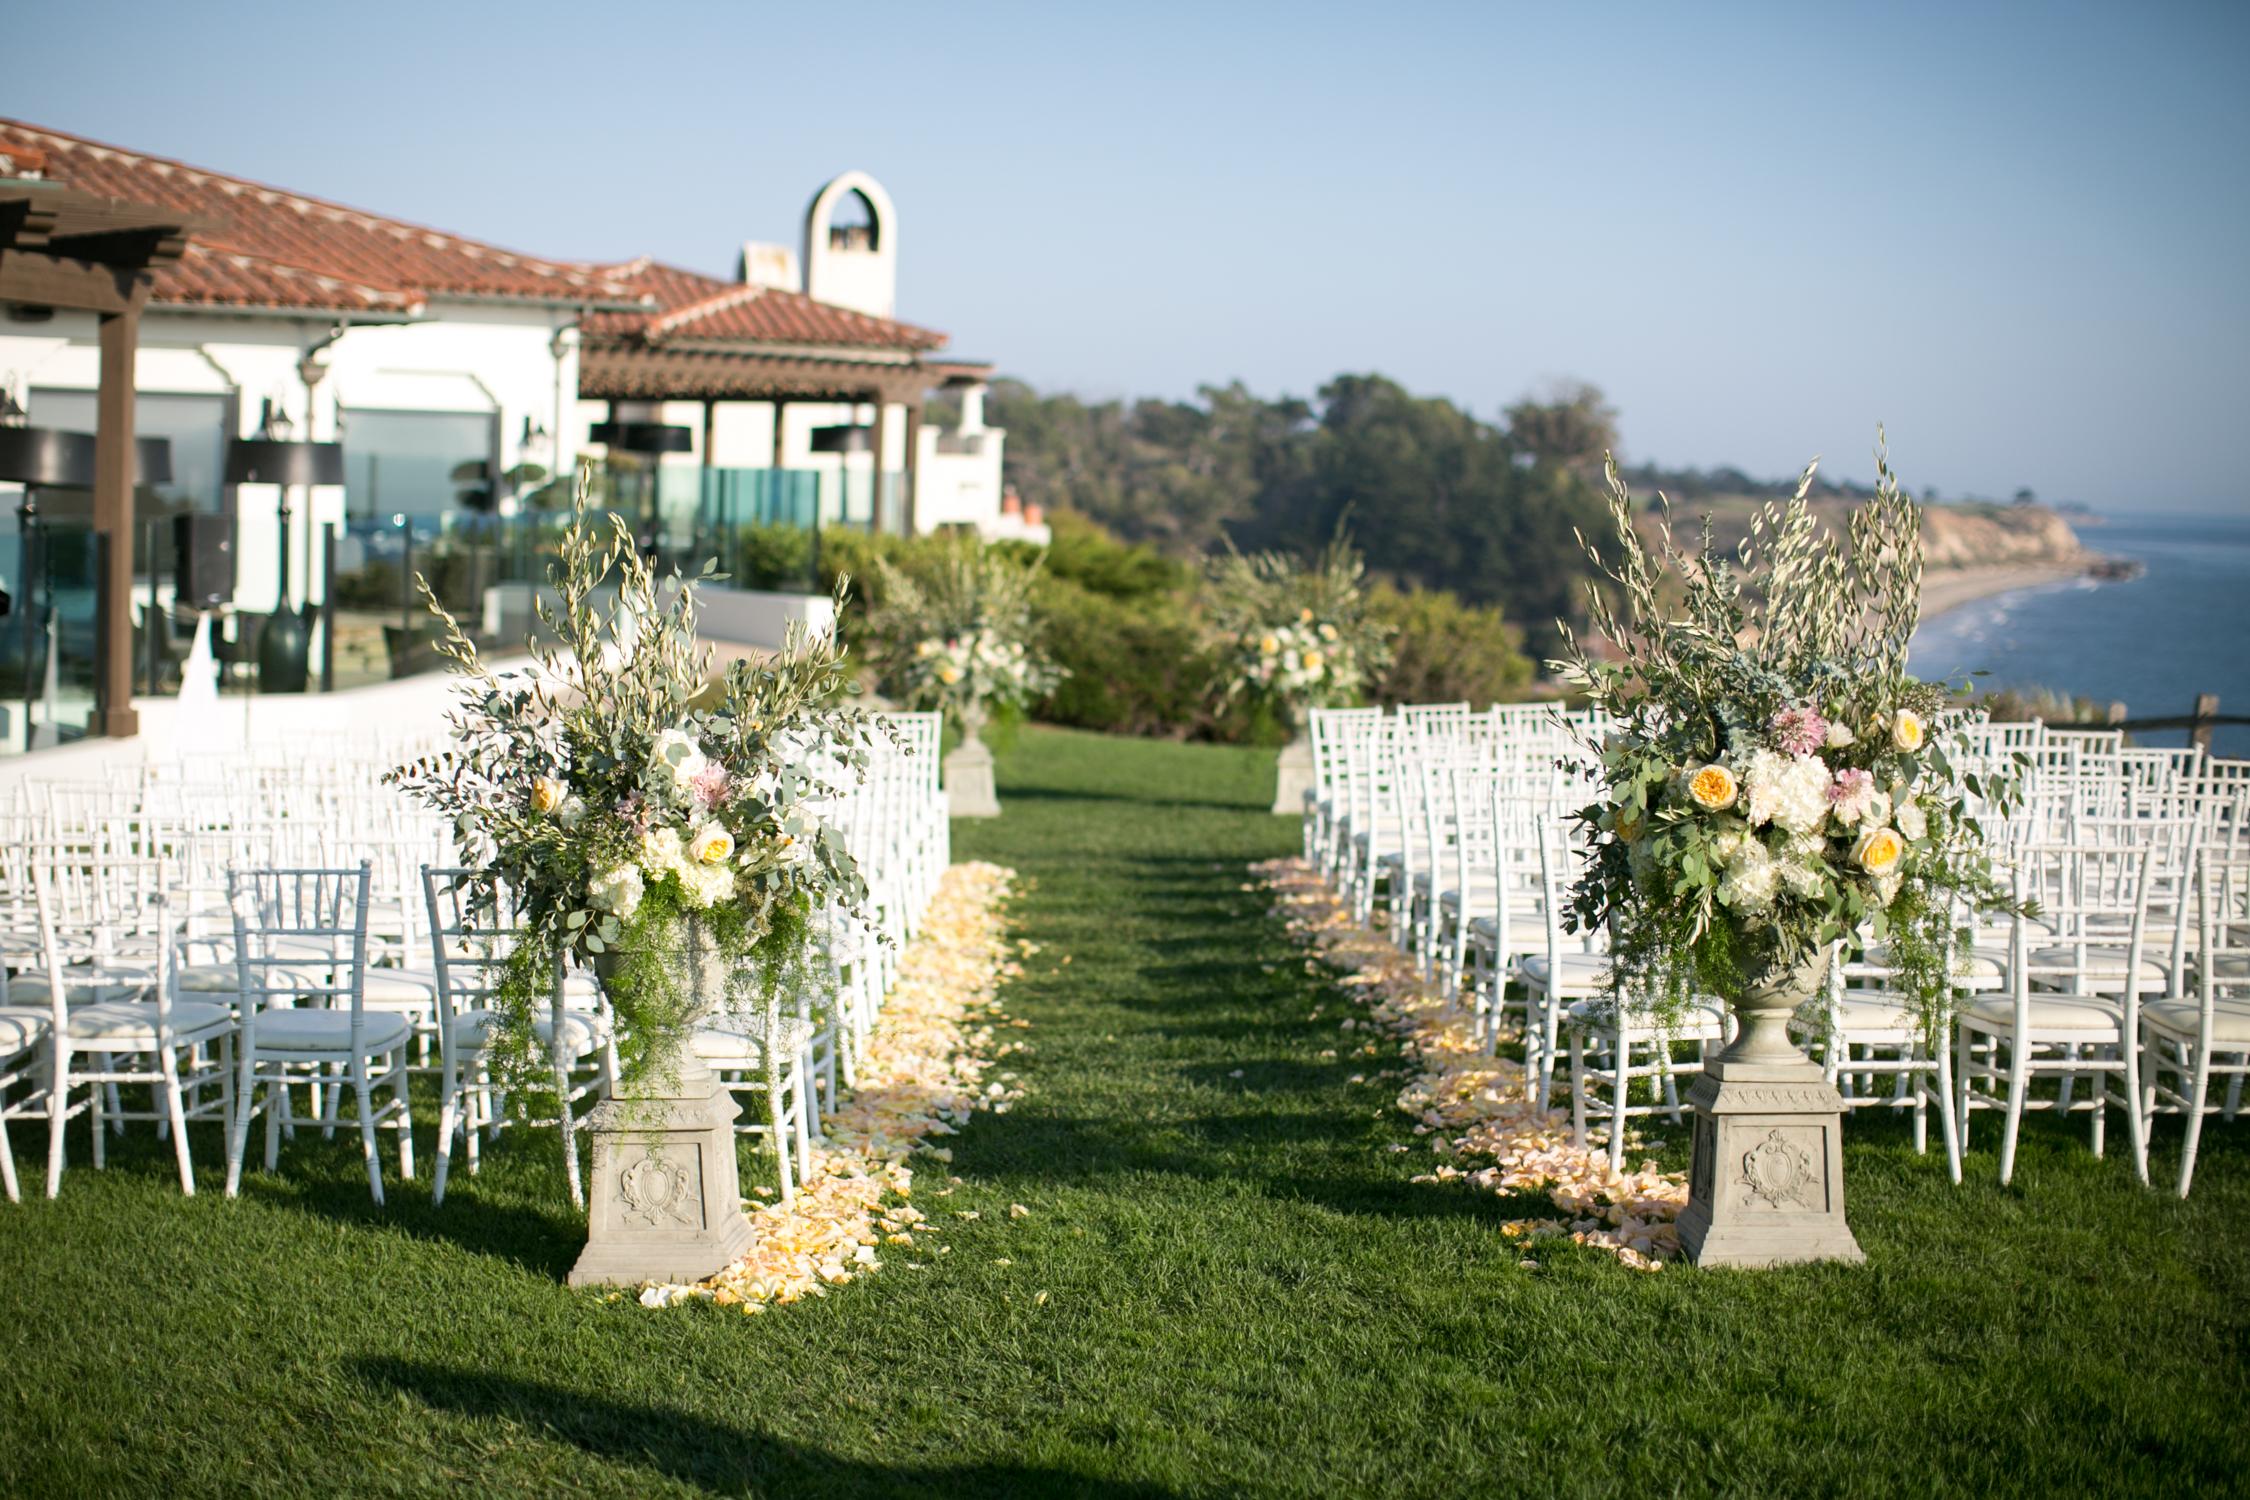 alegria-by-design-wedding-planner-planning-coordinator-day-off-event-design-bacara-resort-ritz-carlton-santa-barbara-garden-ocean-view-location-venue-patio (1).jpg